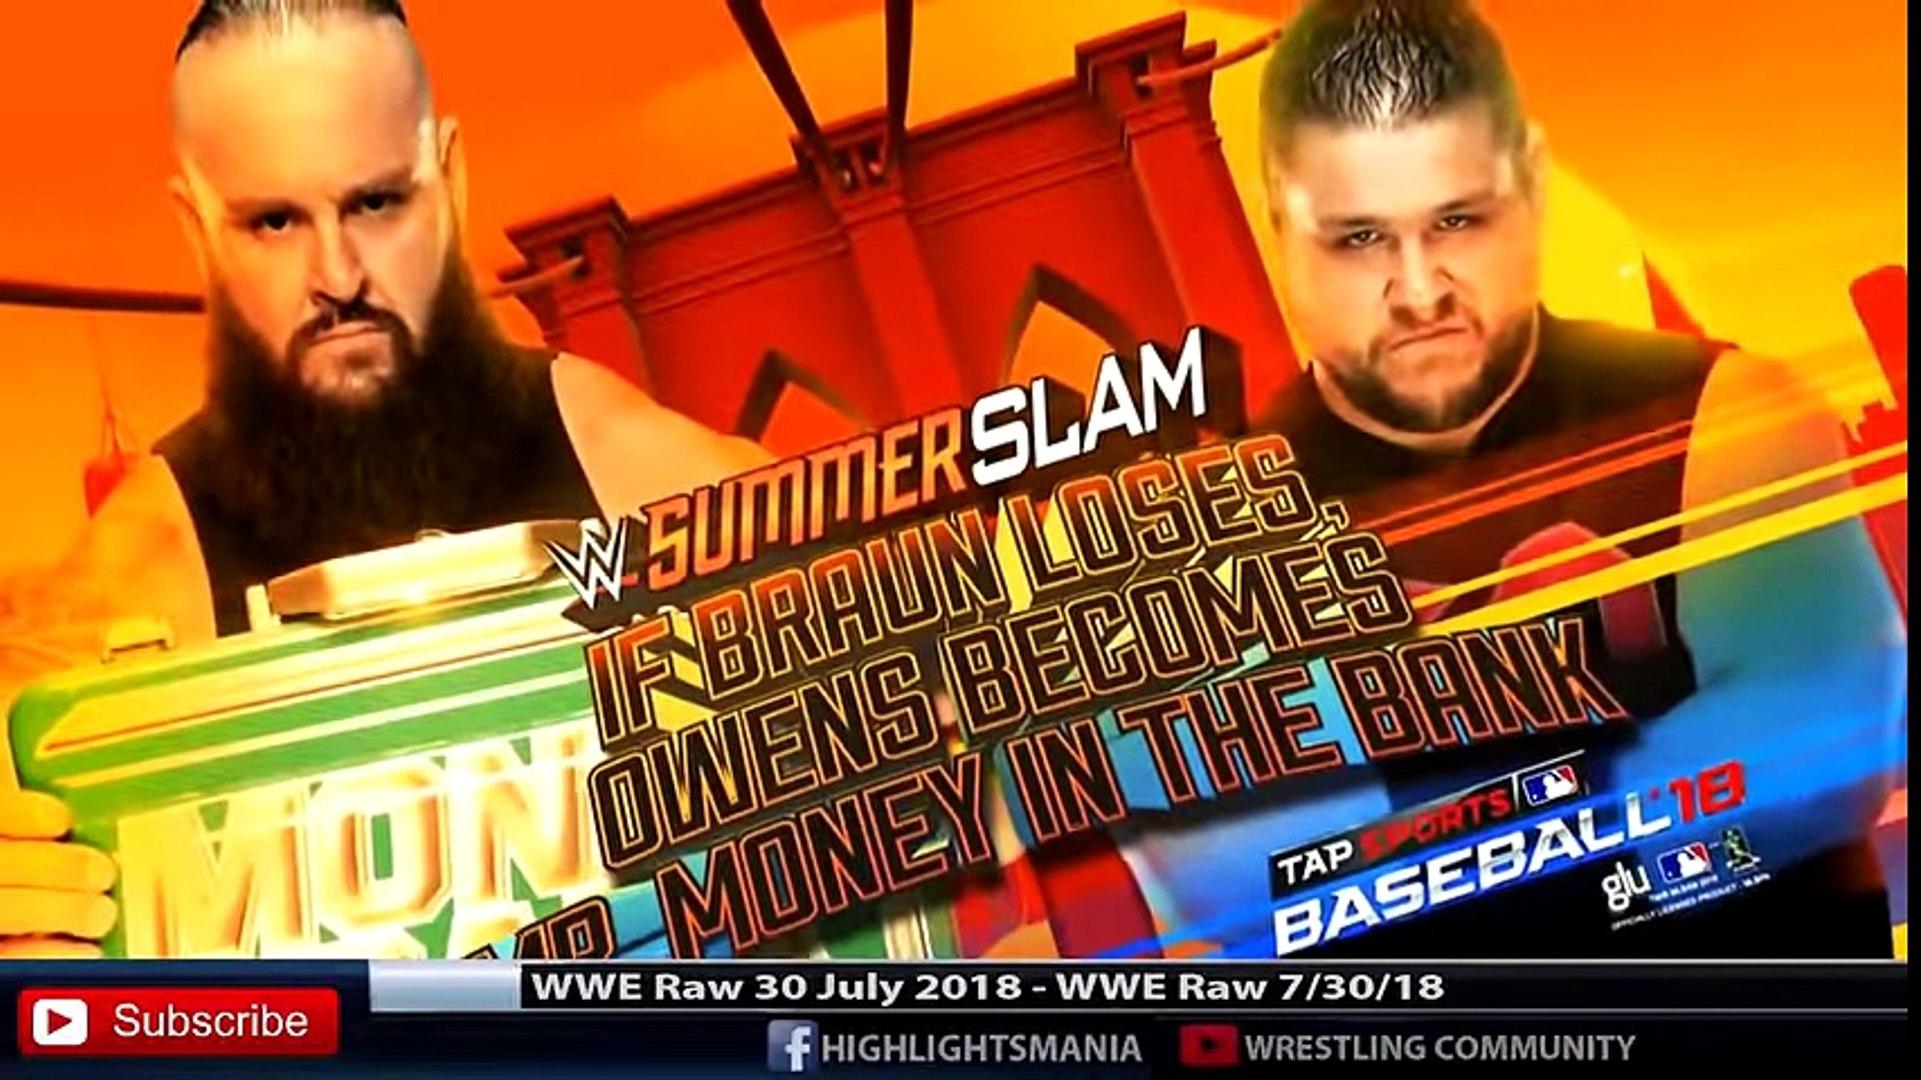 WWE Raw 30 July 20 WWE Raw 30 July 2018 Highlights HD - wwe raw 7_30_18 highlights 18 Highlights HD